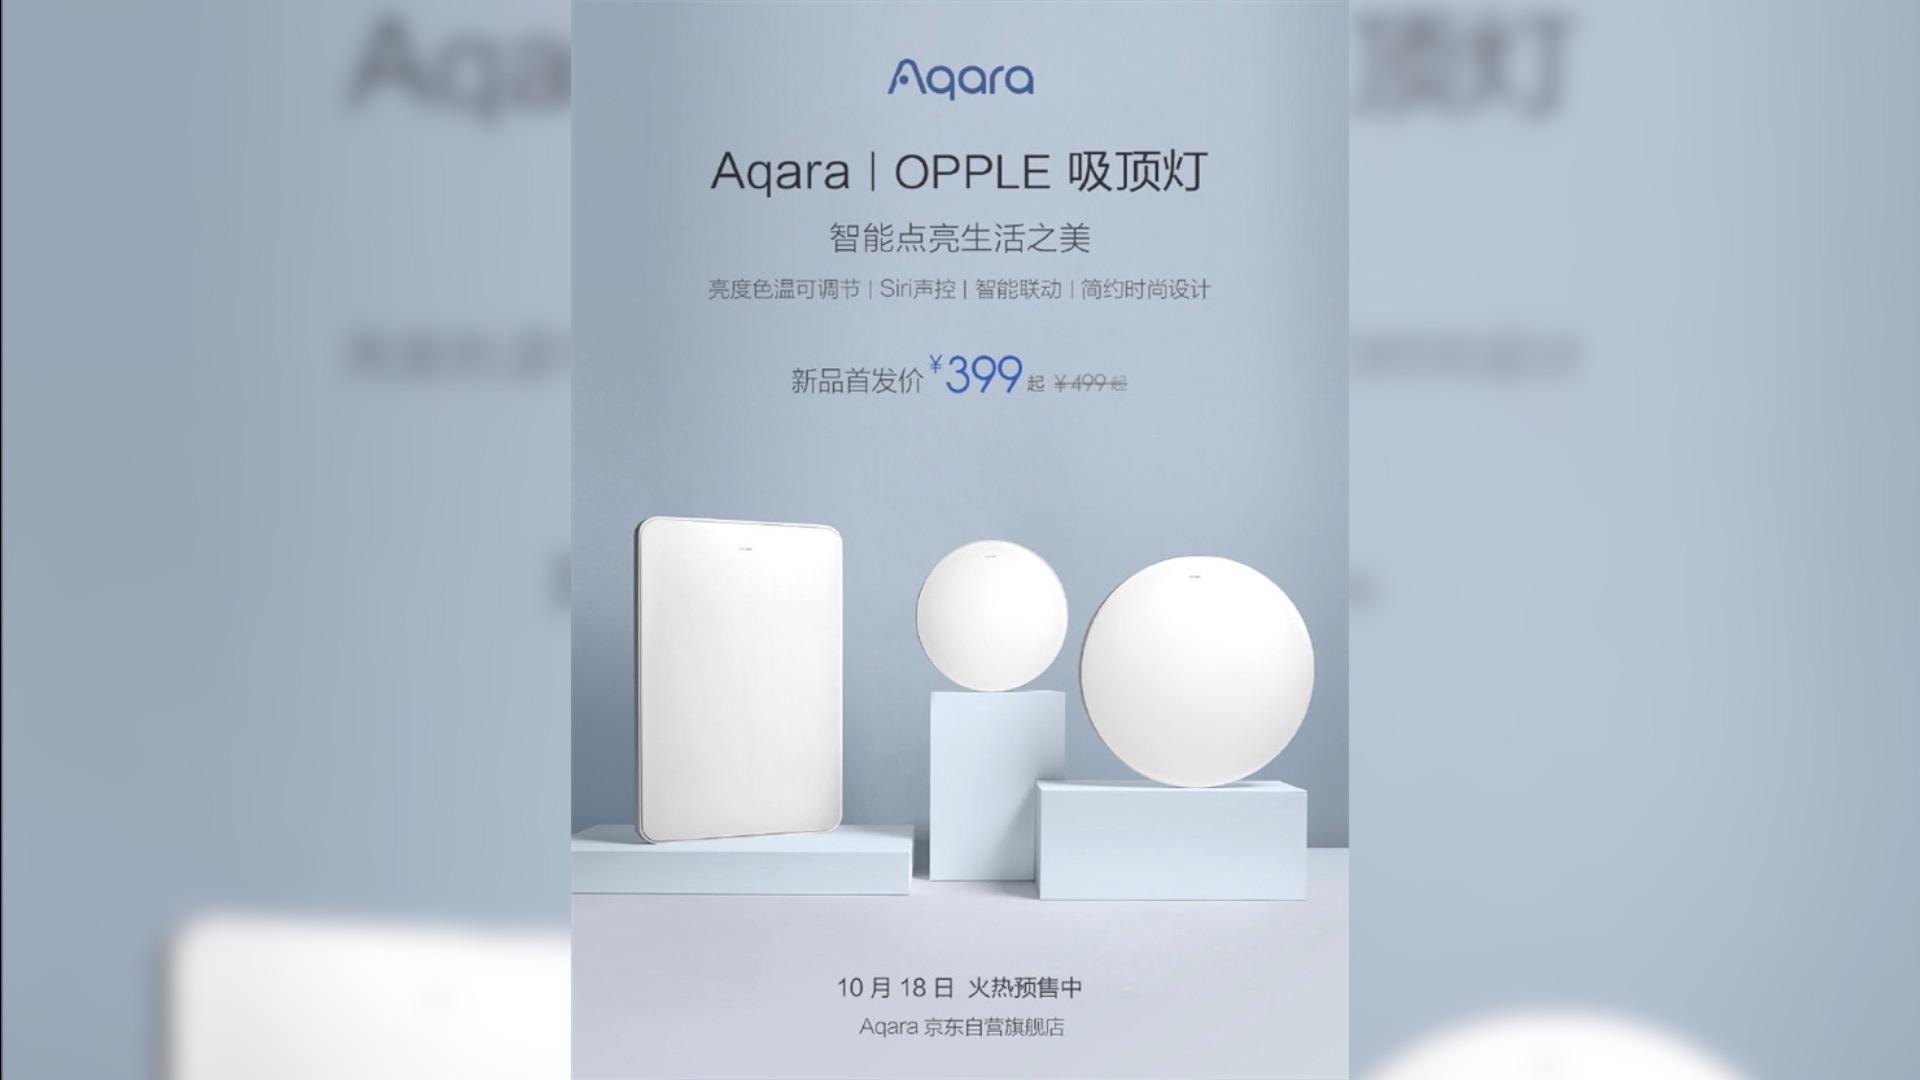 Xiaomi Aqara OPPLE